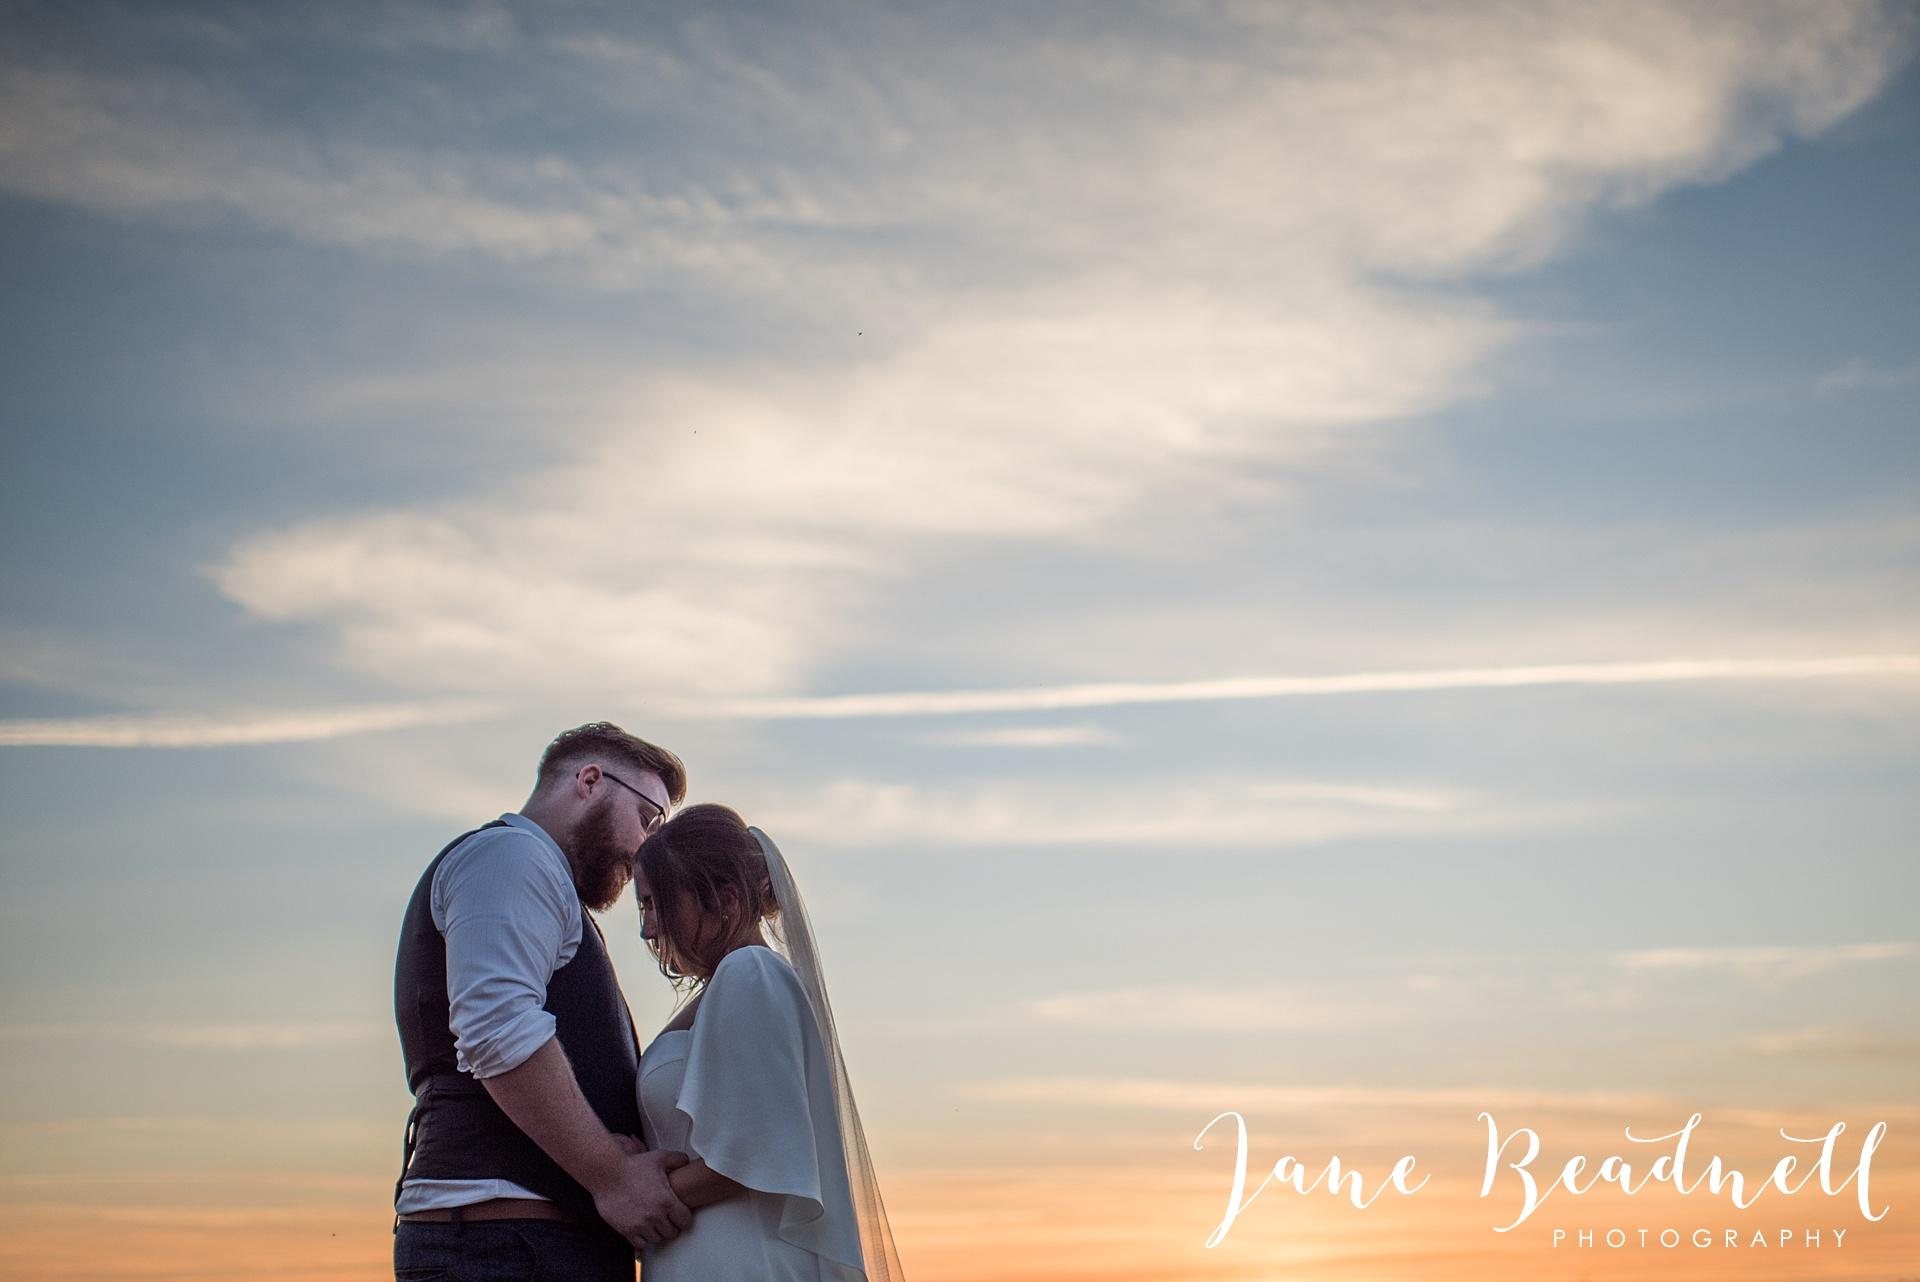 fine-art-wedding-photographer-jane-beadnell-yorkshire-wedding-photographer_0156